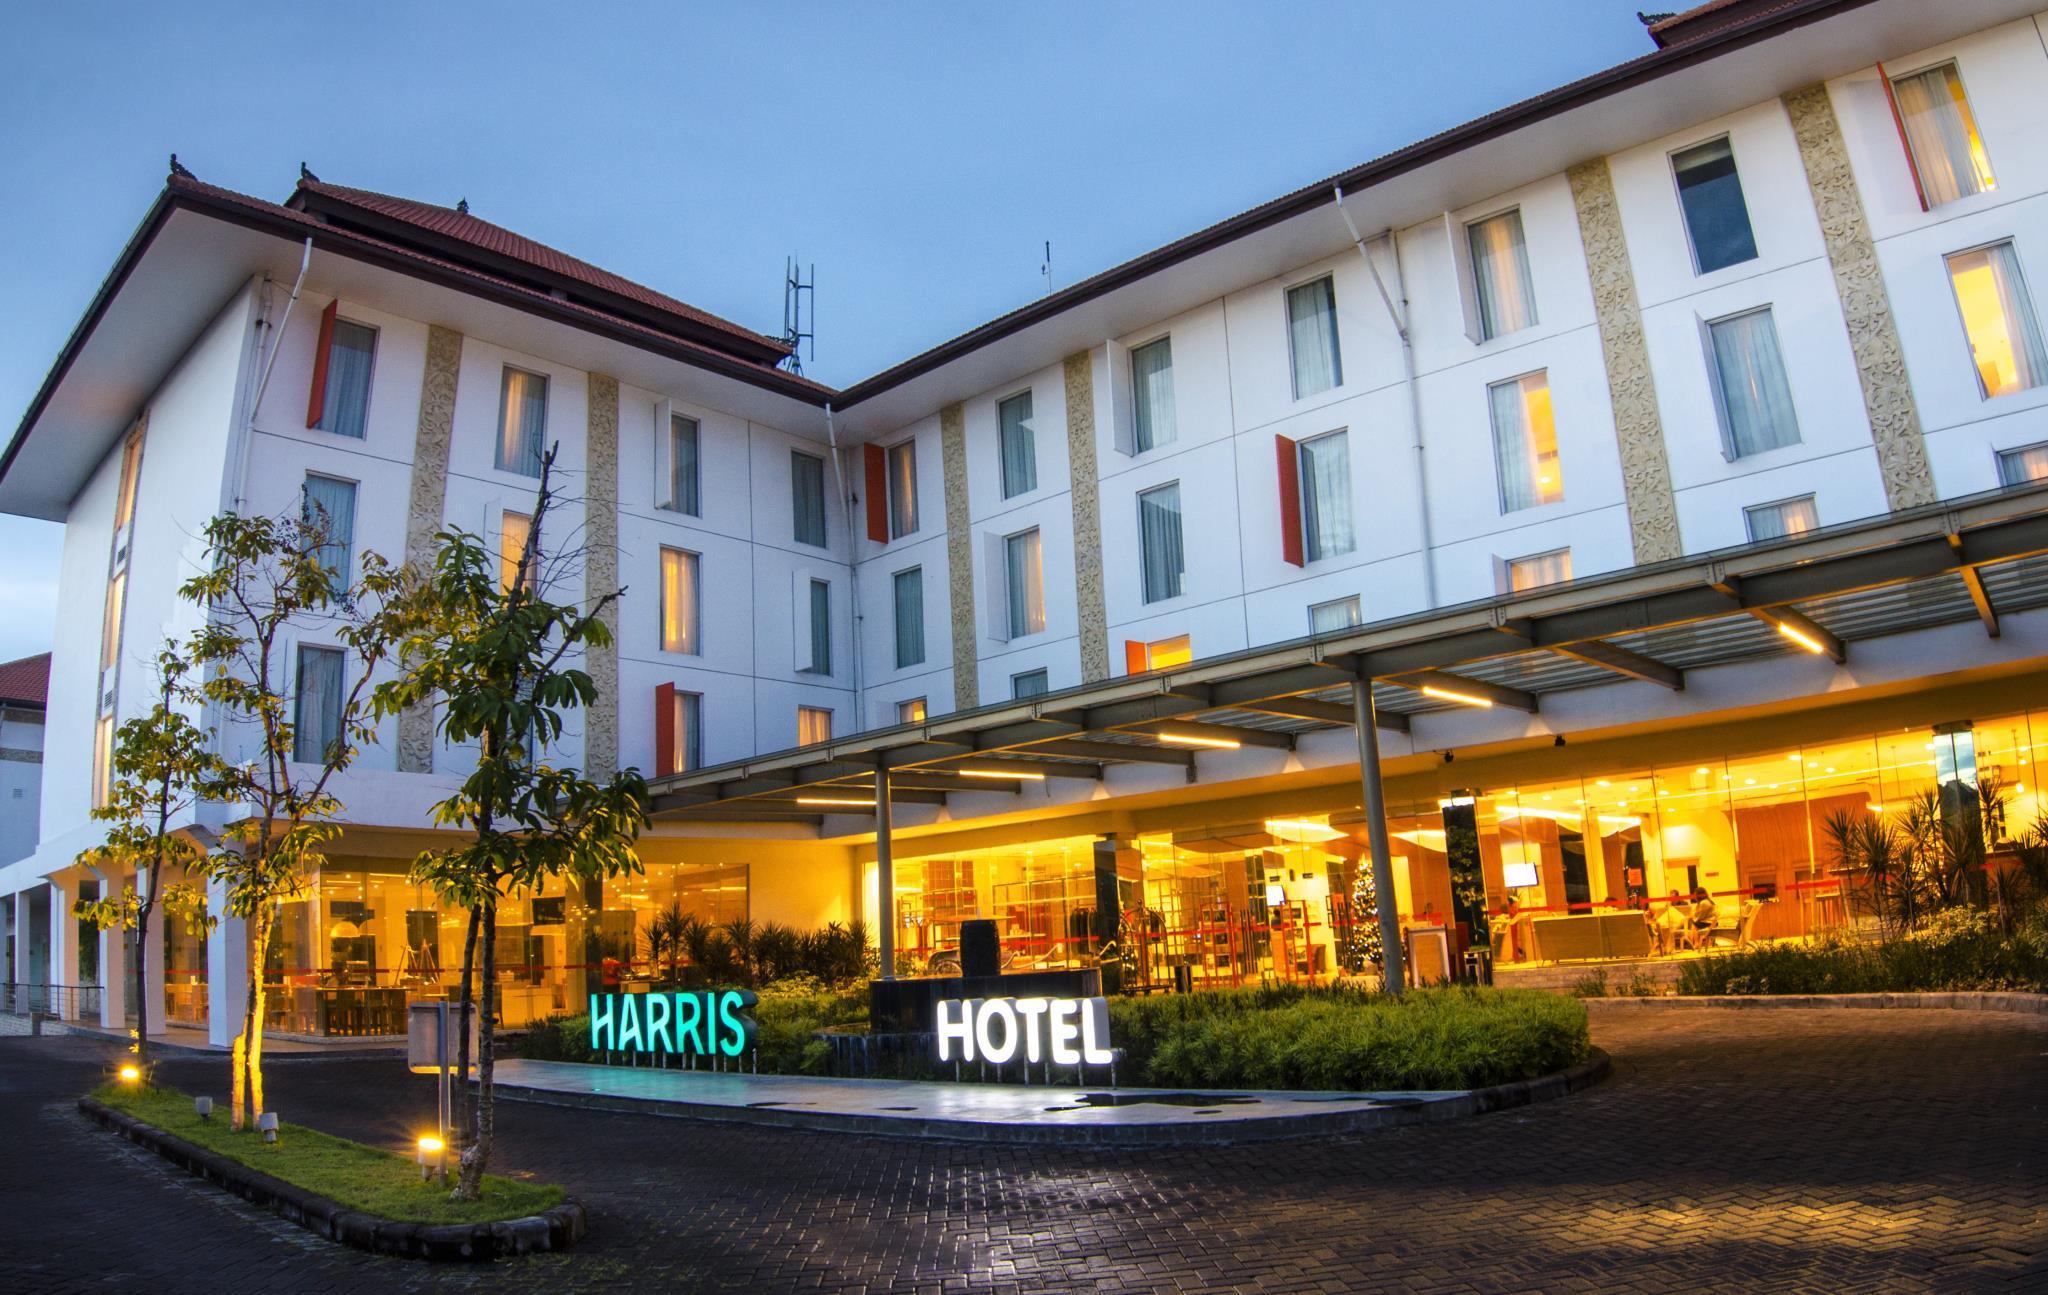 HARRIS Hotel & Conventions Denpasar Bali ホテル詳細